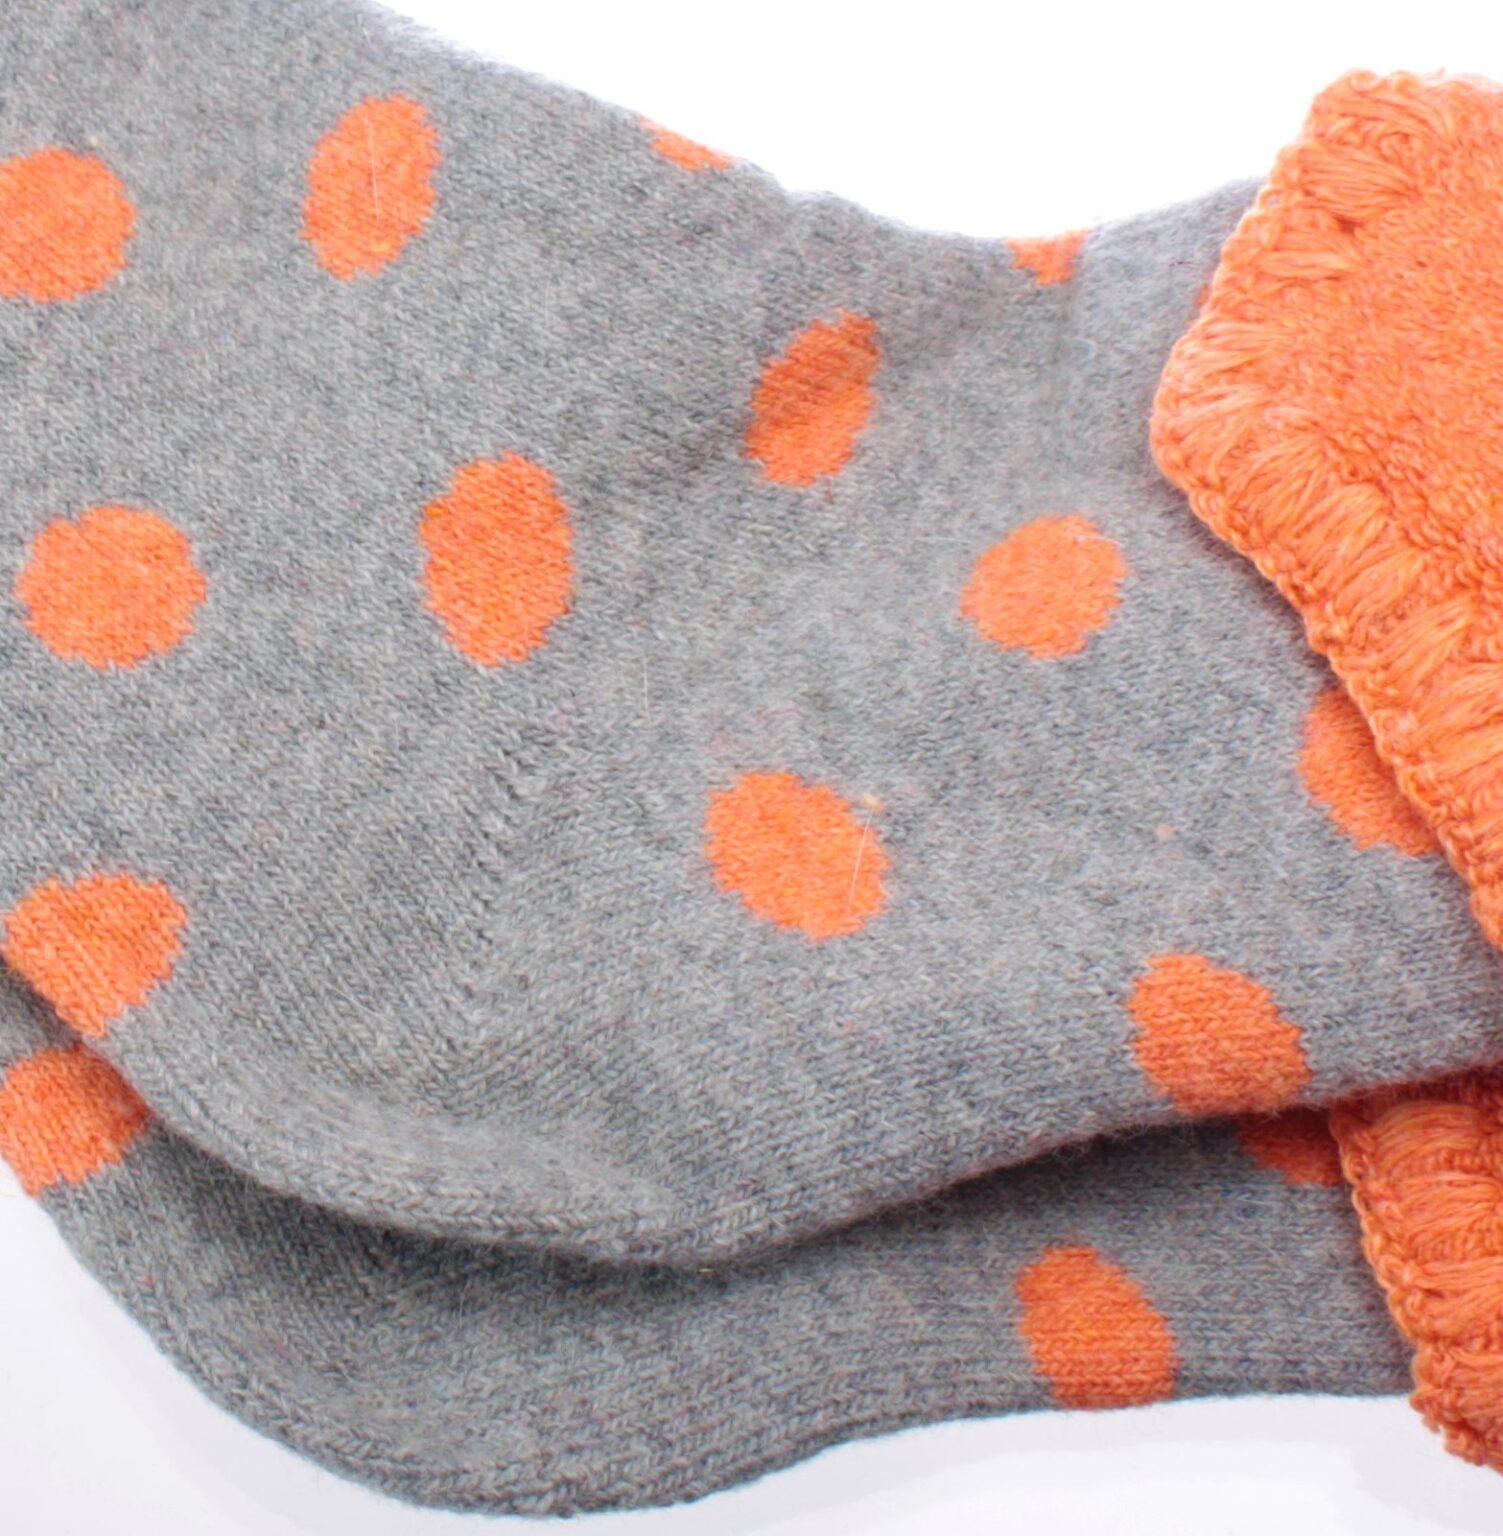 Jess & Lou Socks - Grey/Orange Spot